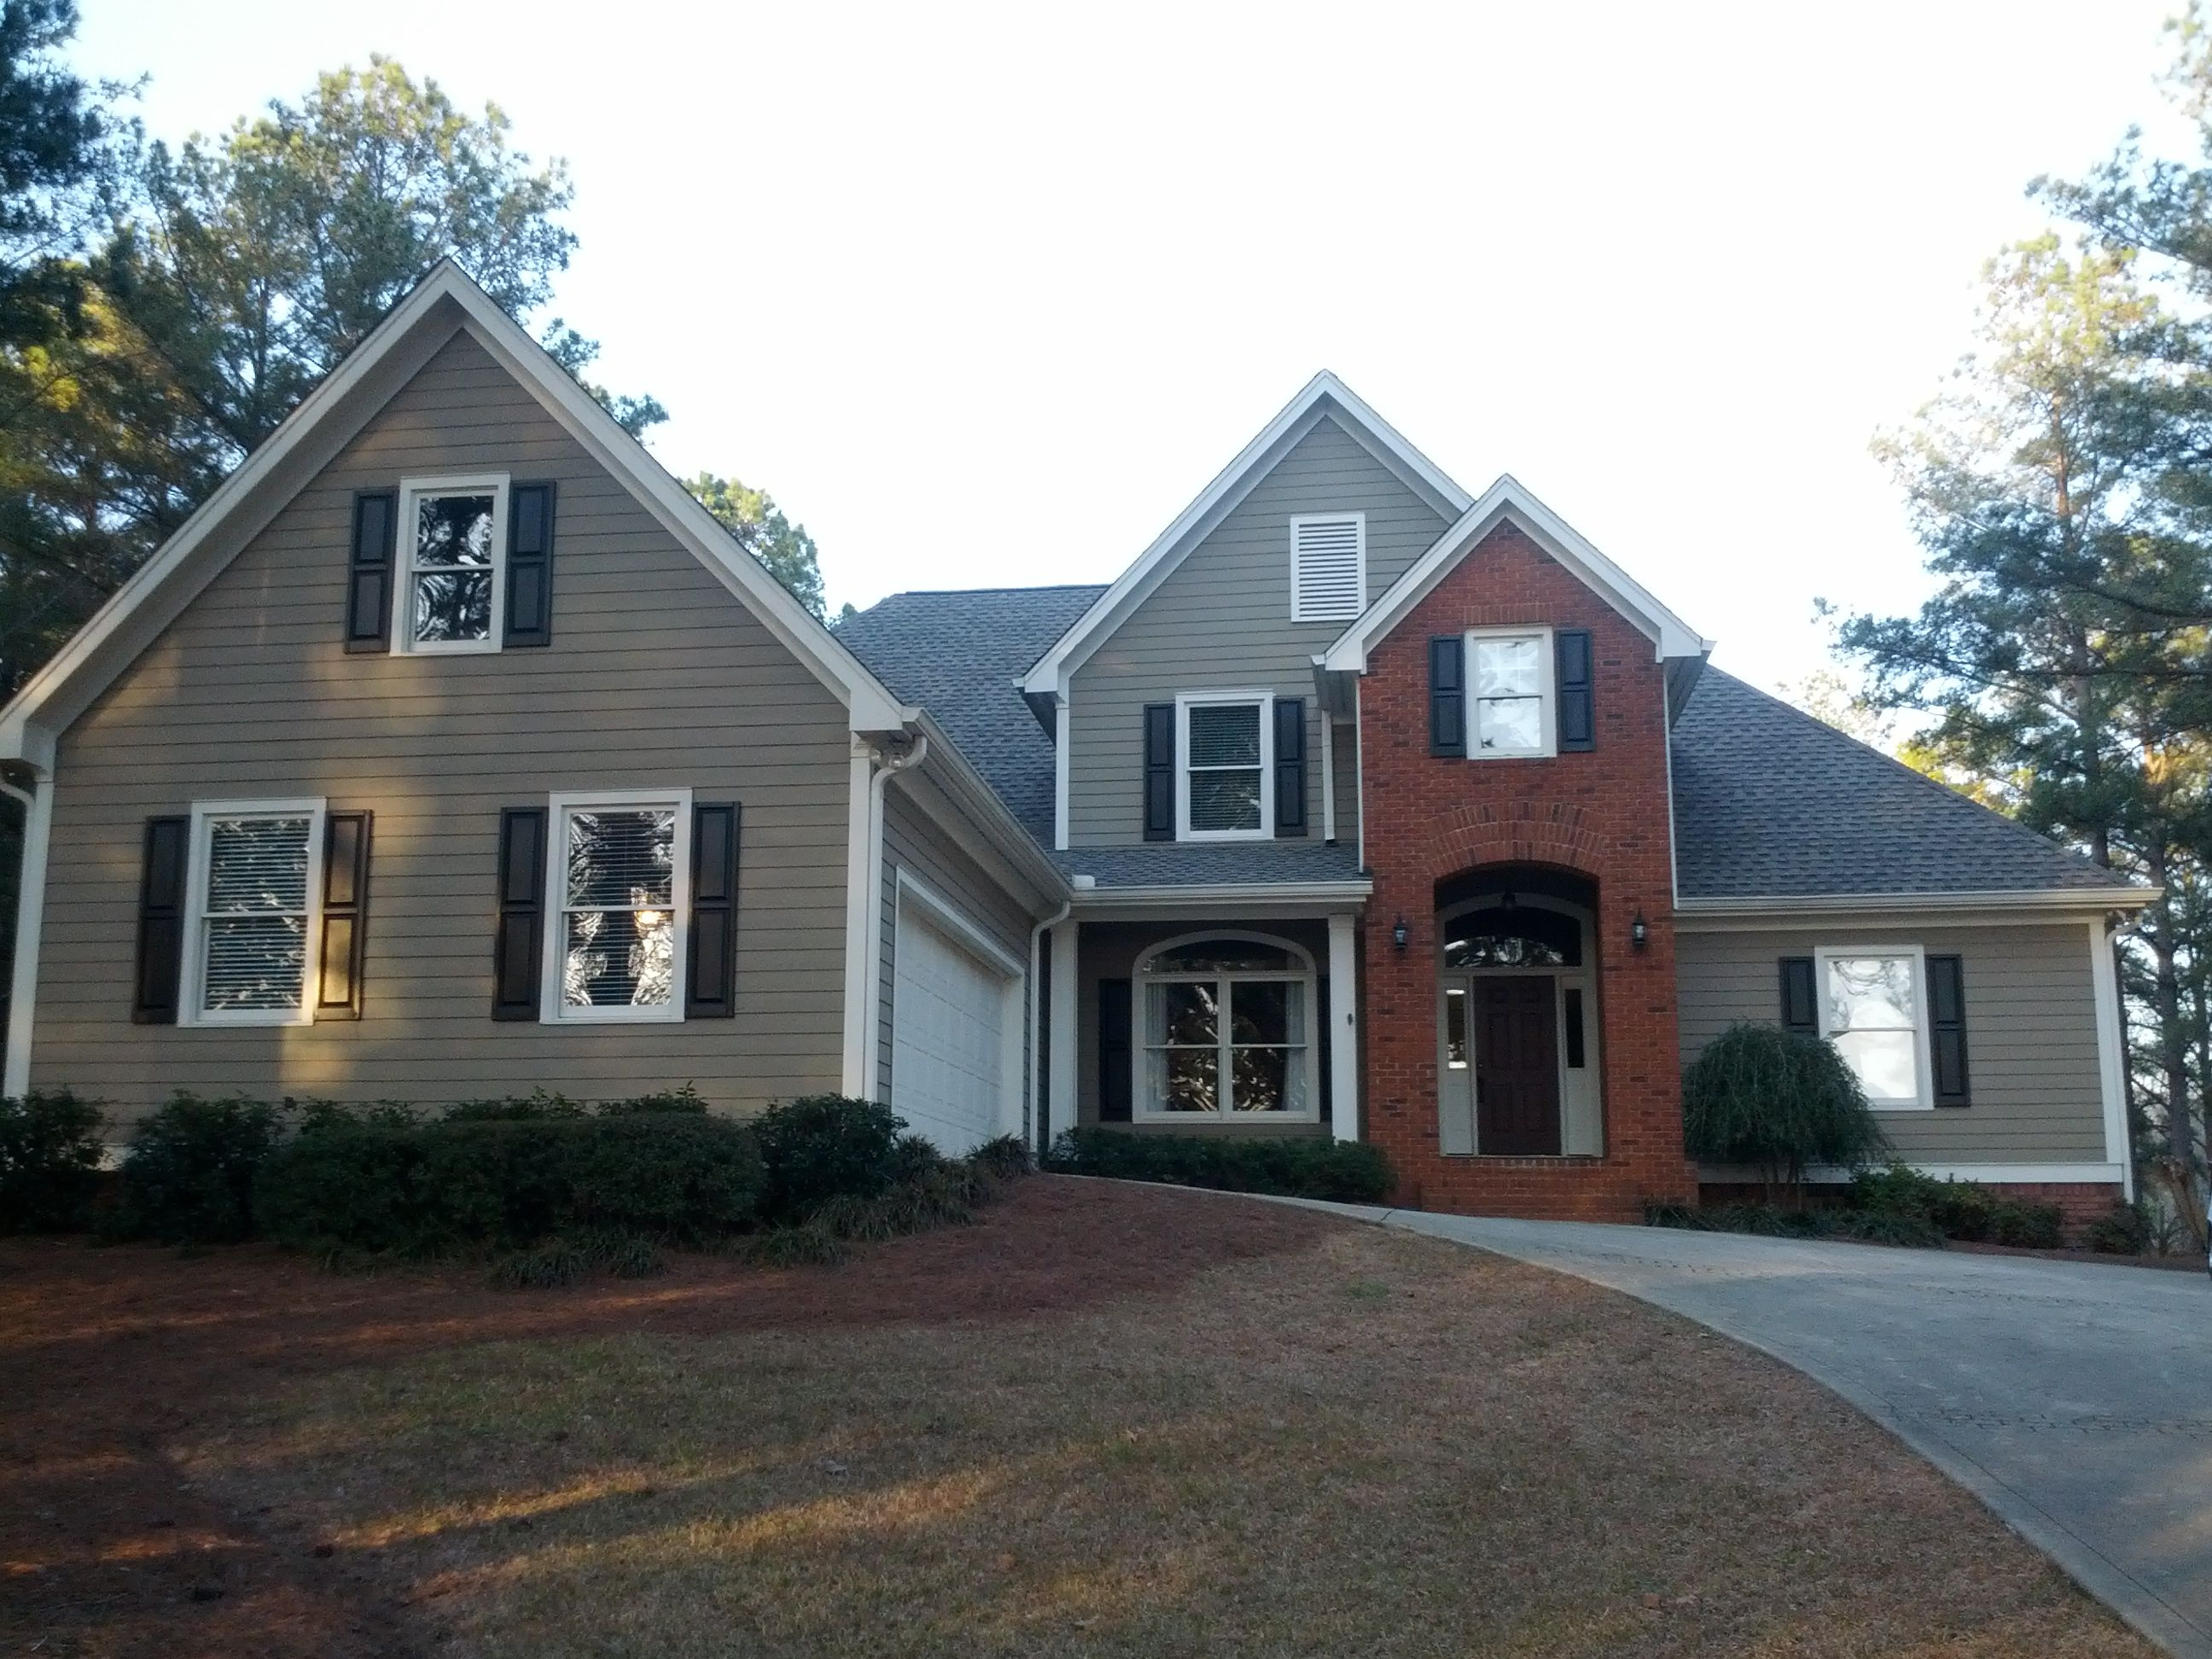 Exterior house color schemes siding - Tan Vinyl Siding W White Trim And Black Shutters Exterior House Colorssiding